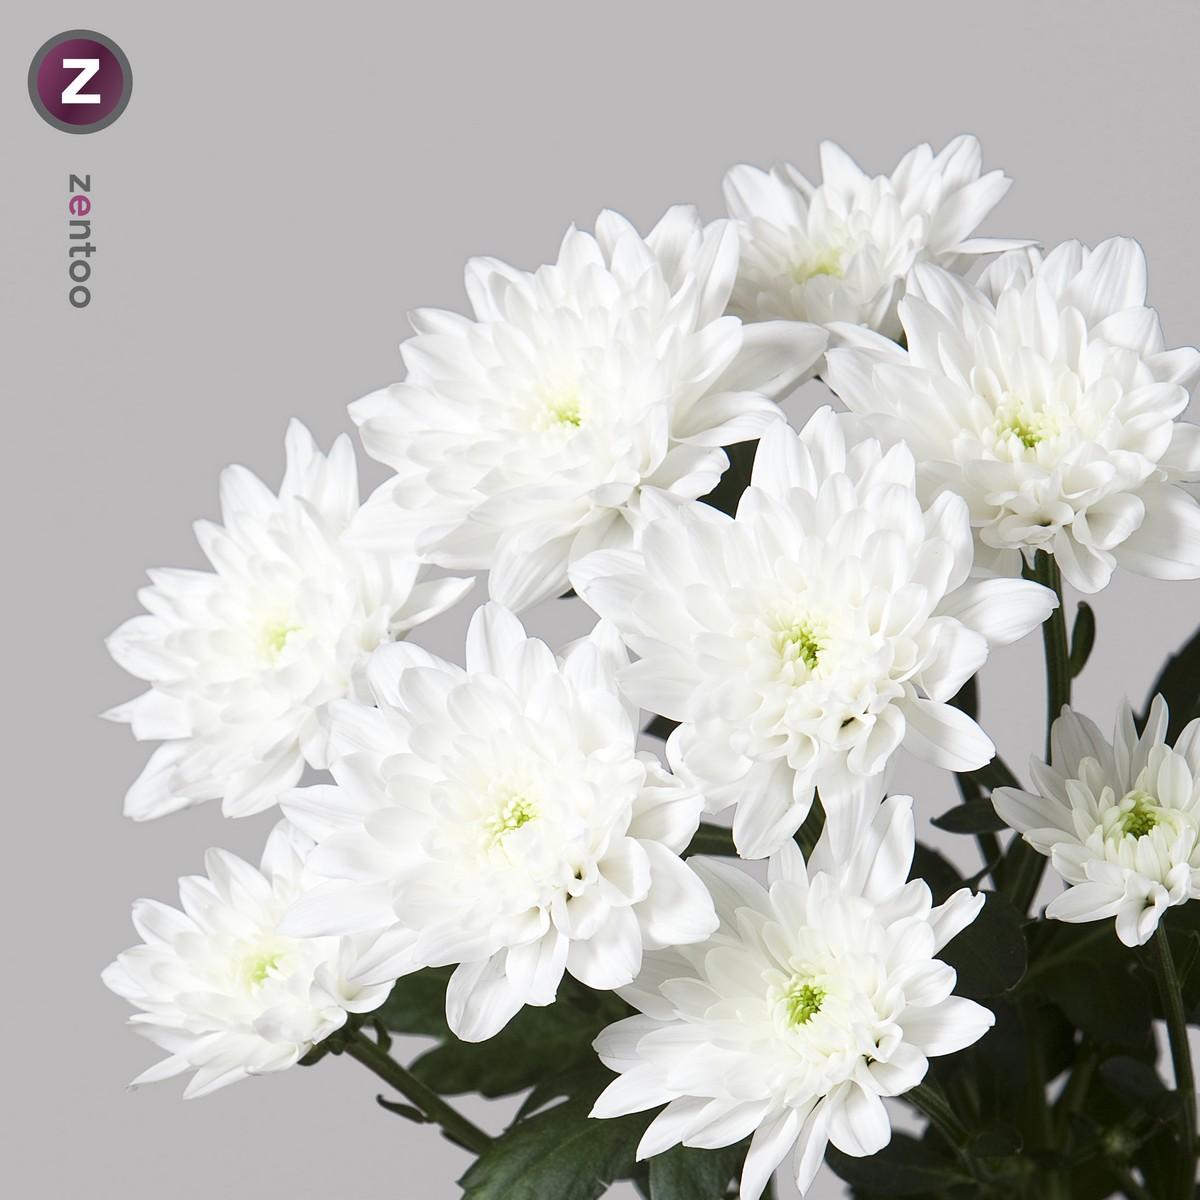 Chrysanthemum spray wholesale flowers uk wedding flowers aalsmeer auction chrysant spr baltica mightylinksfo